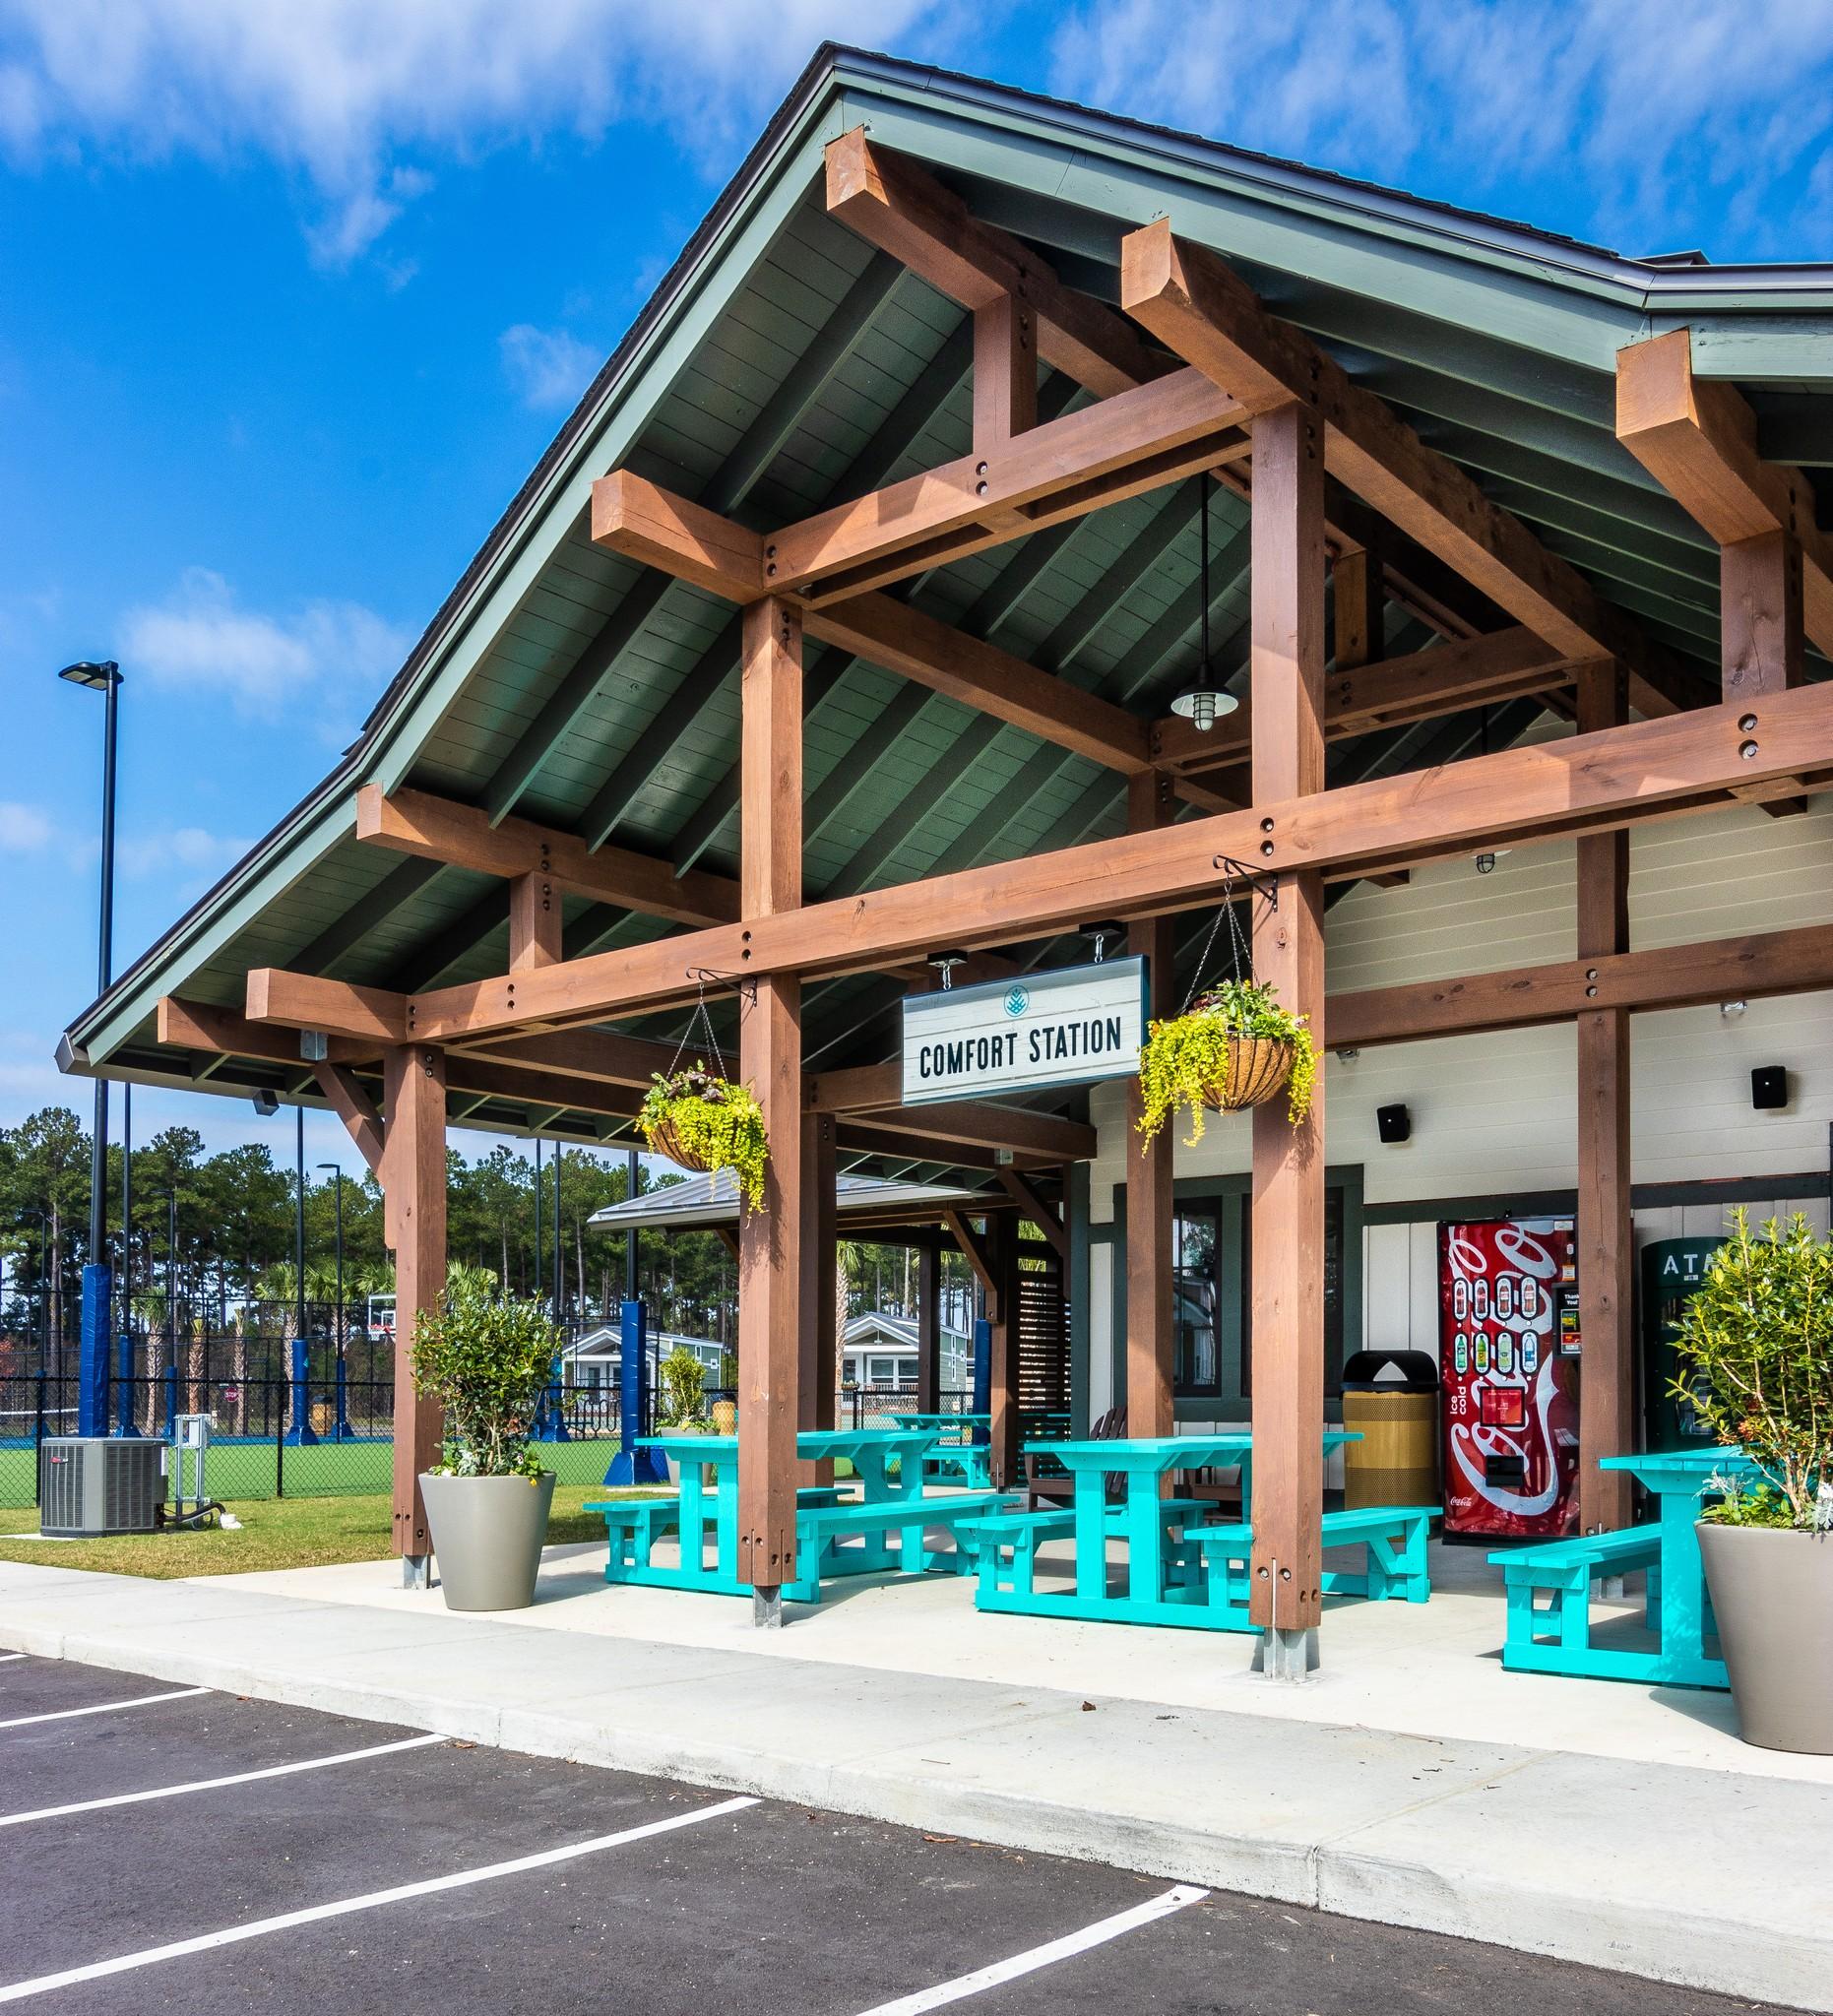 Carolina Pines RV Resort Park and Amenity Center